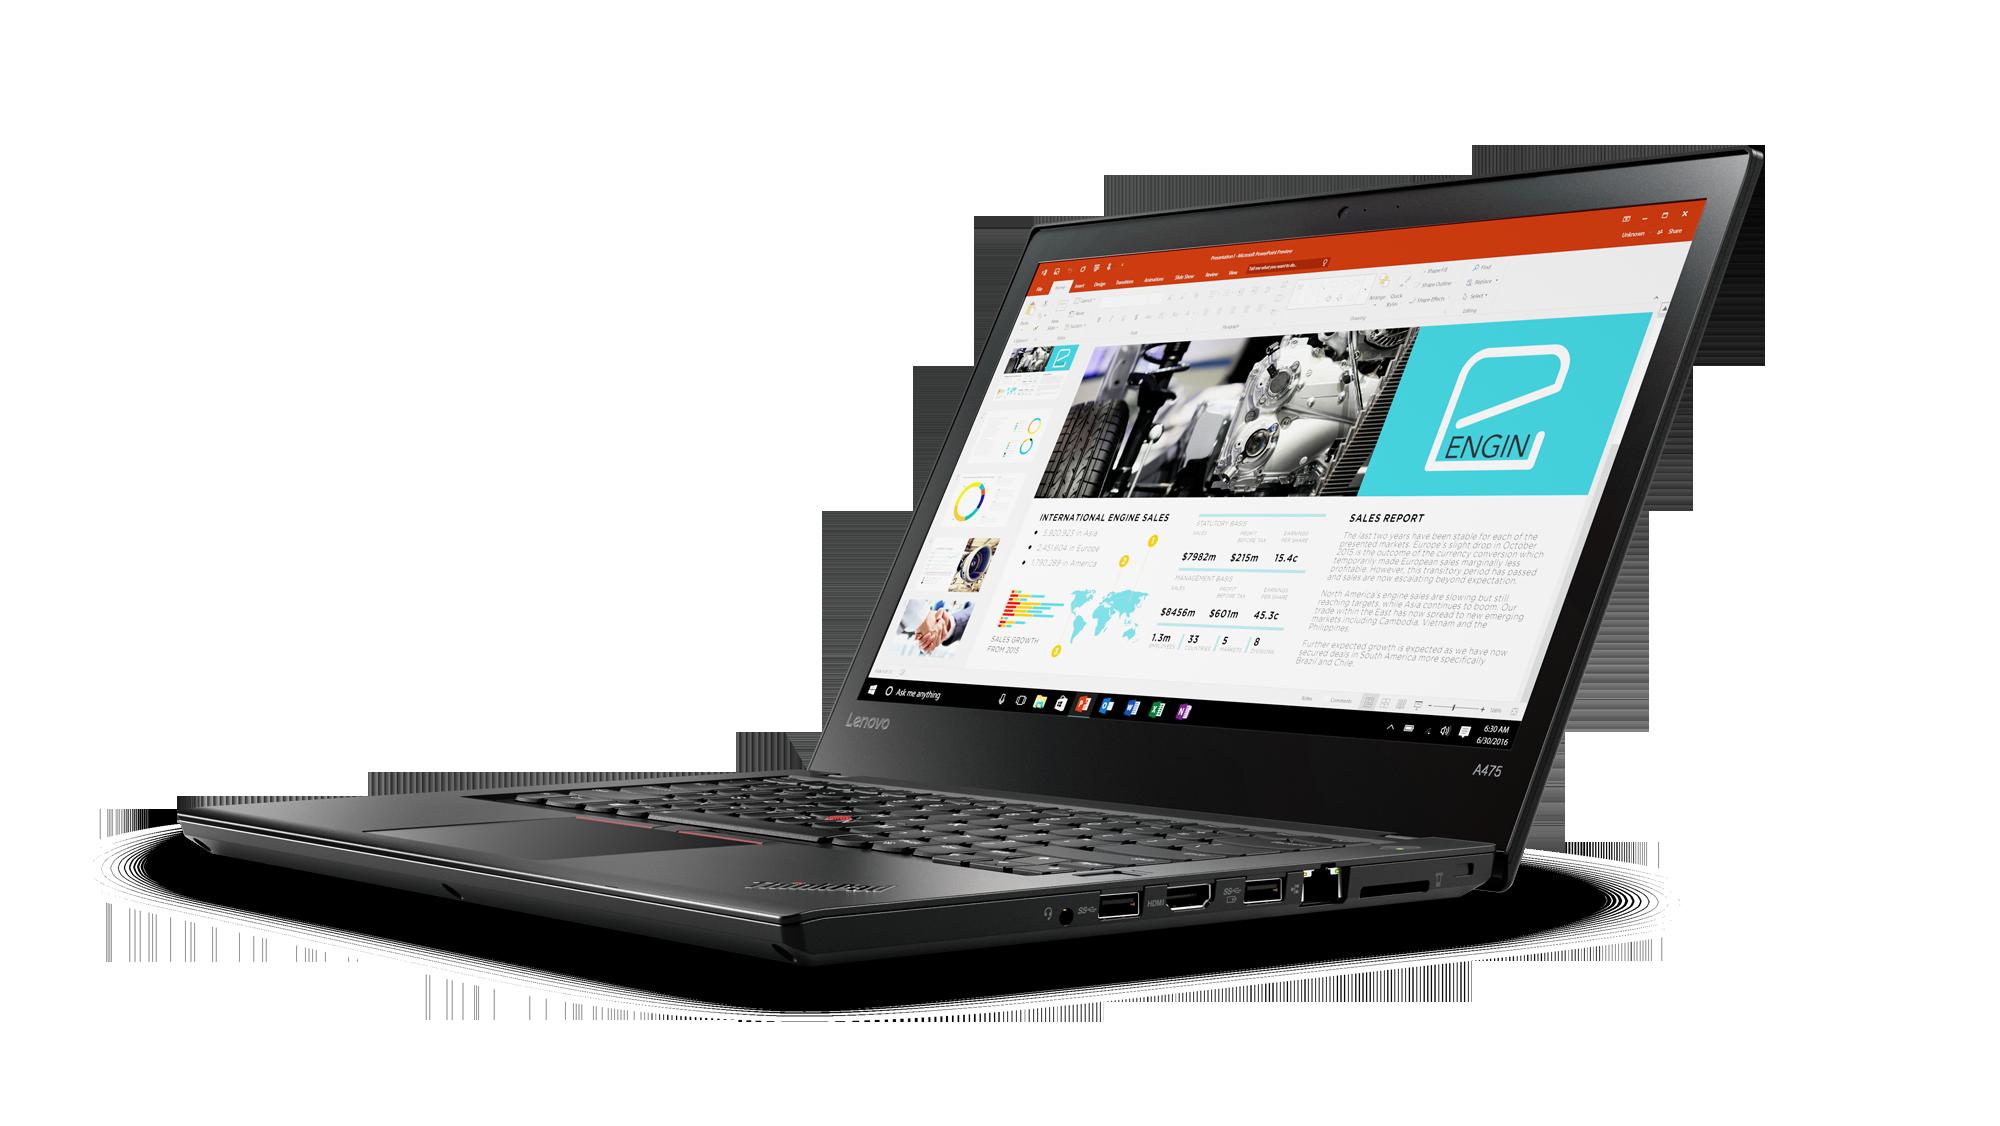 В Российской Федерации представлен ноутбук бизнес-класса Lenovo ThinkPad A475 спроцессором AMD Pro